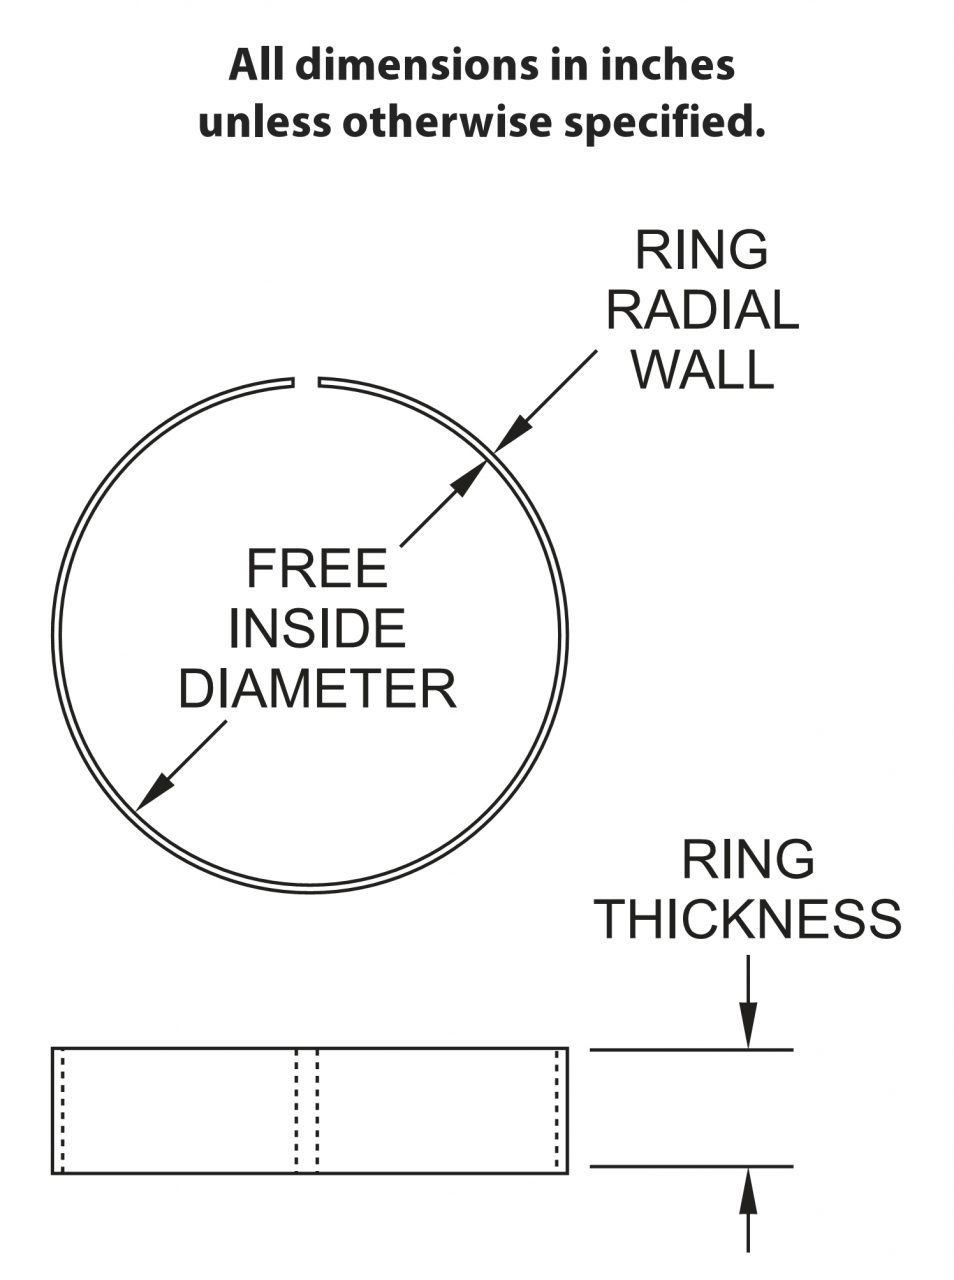 prod-hoopster-external-metric-2.jpg